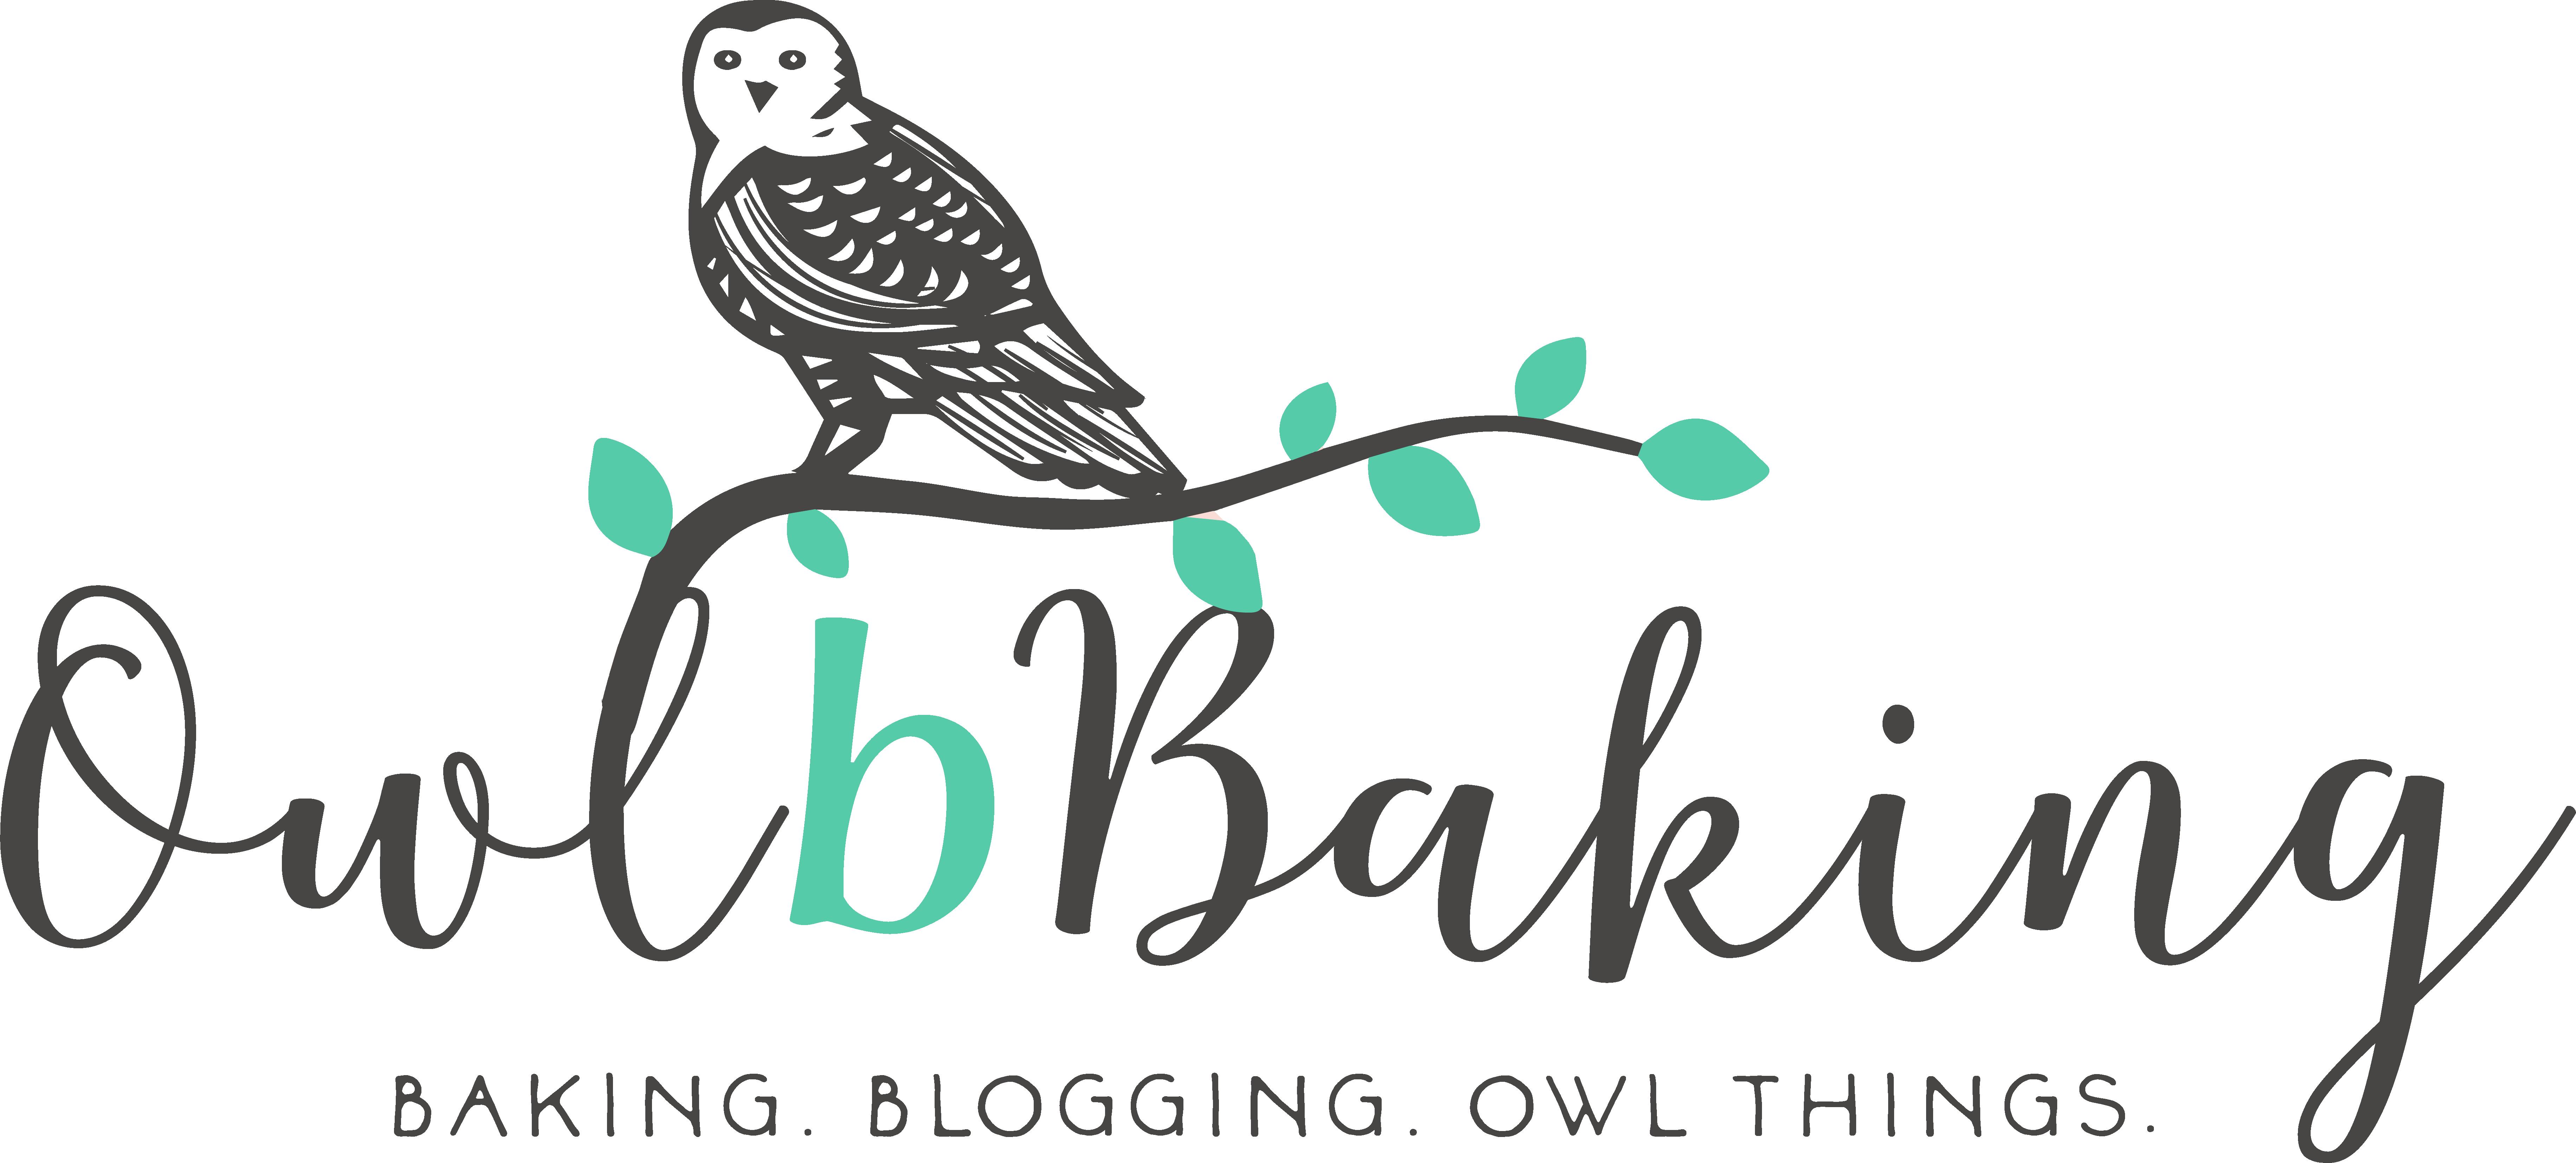 Food Blogging | by Owlbbaking.com